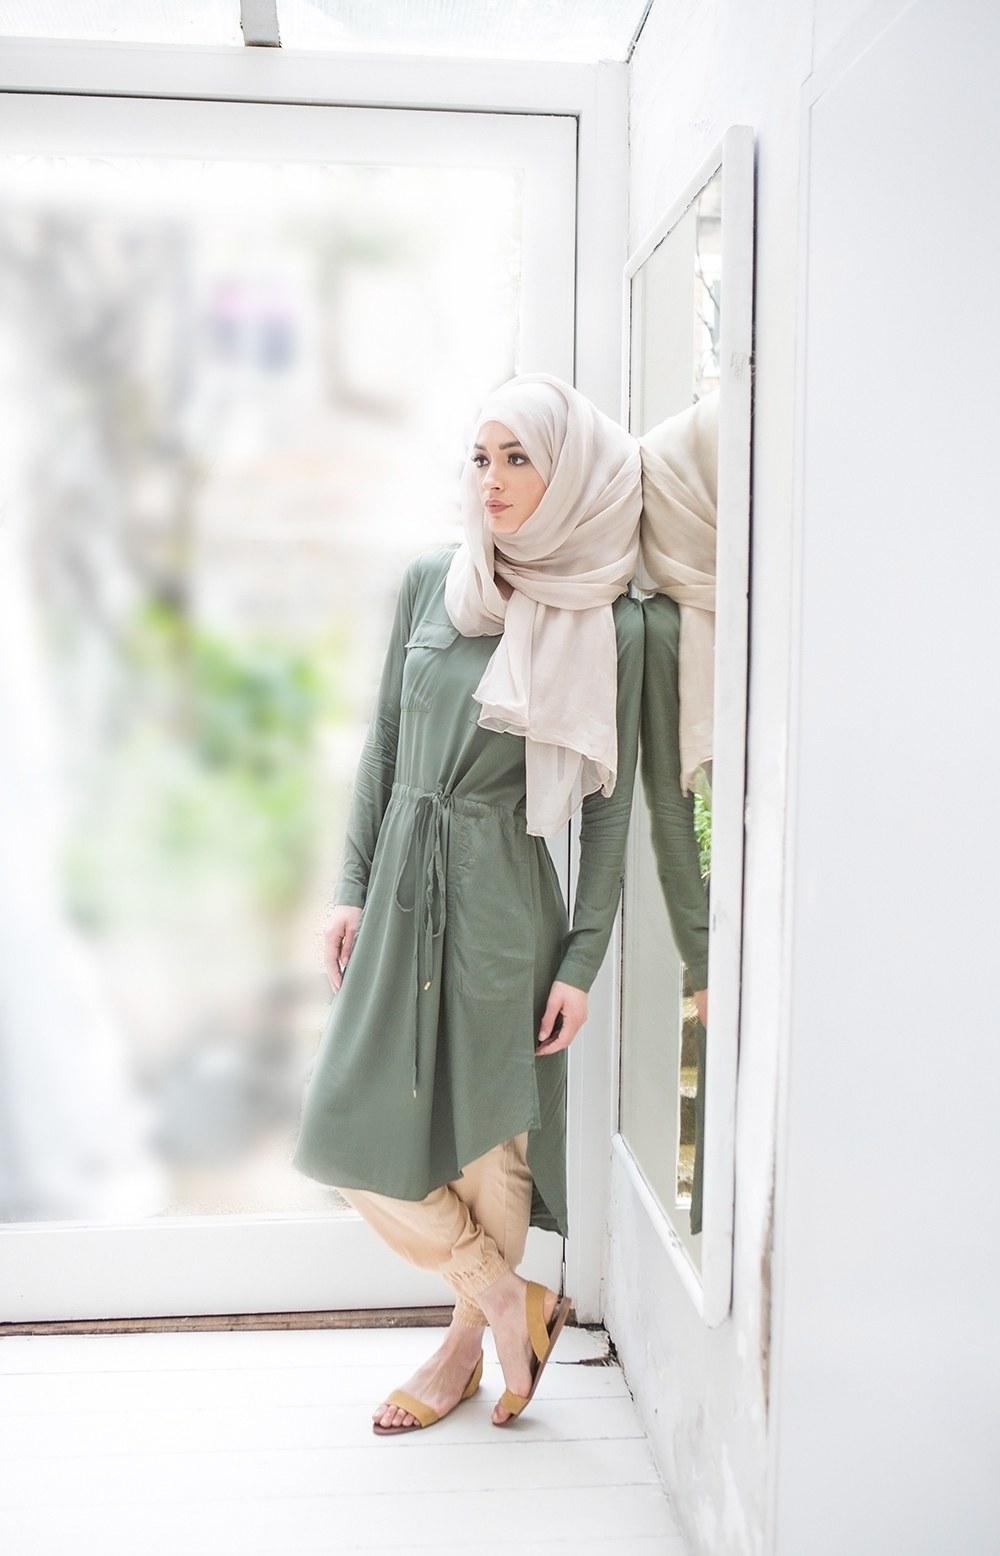 Inspirasi Model Baju Lebaran Tahun 2018 9ddf 25 Trend Model Baju Muslim Lebaran 2018 Simple & Modis